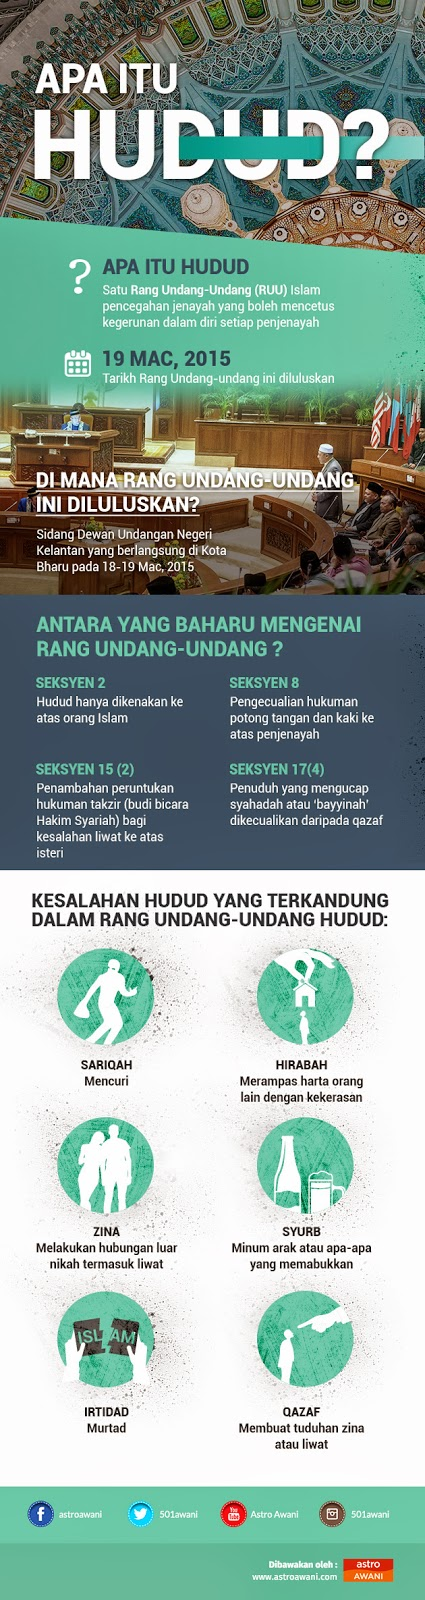 Infografik Memahami Apa Itu Hudud